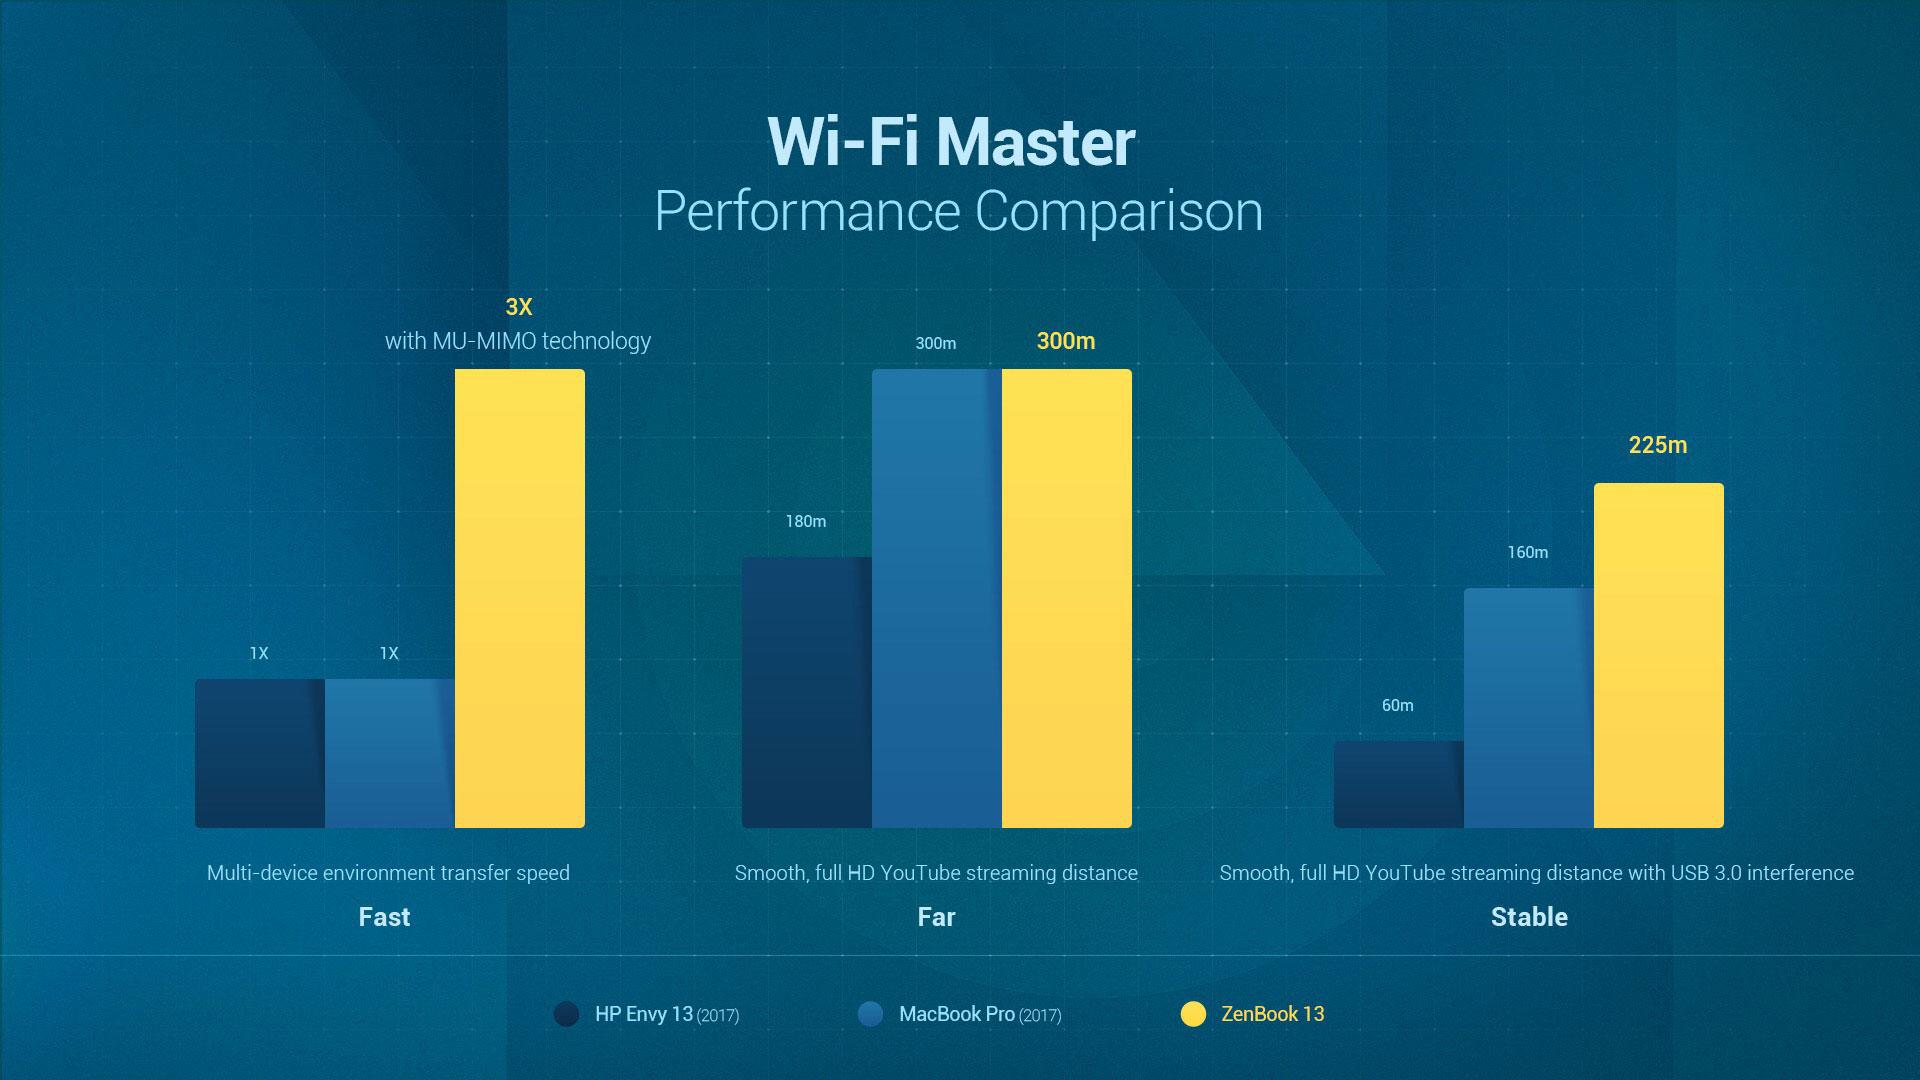 wifimaster-chart3-jpg.9322